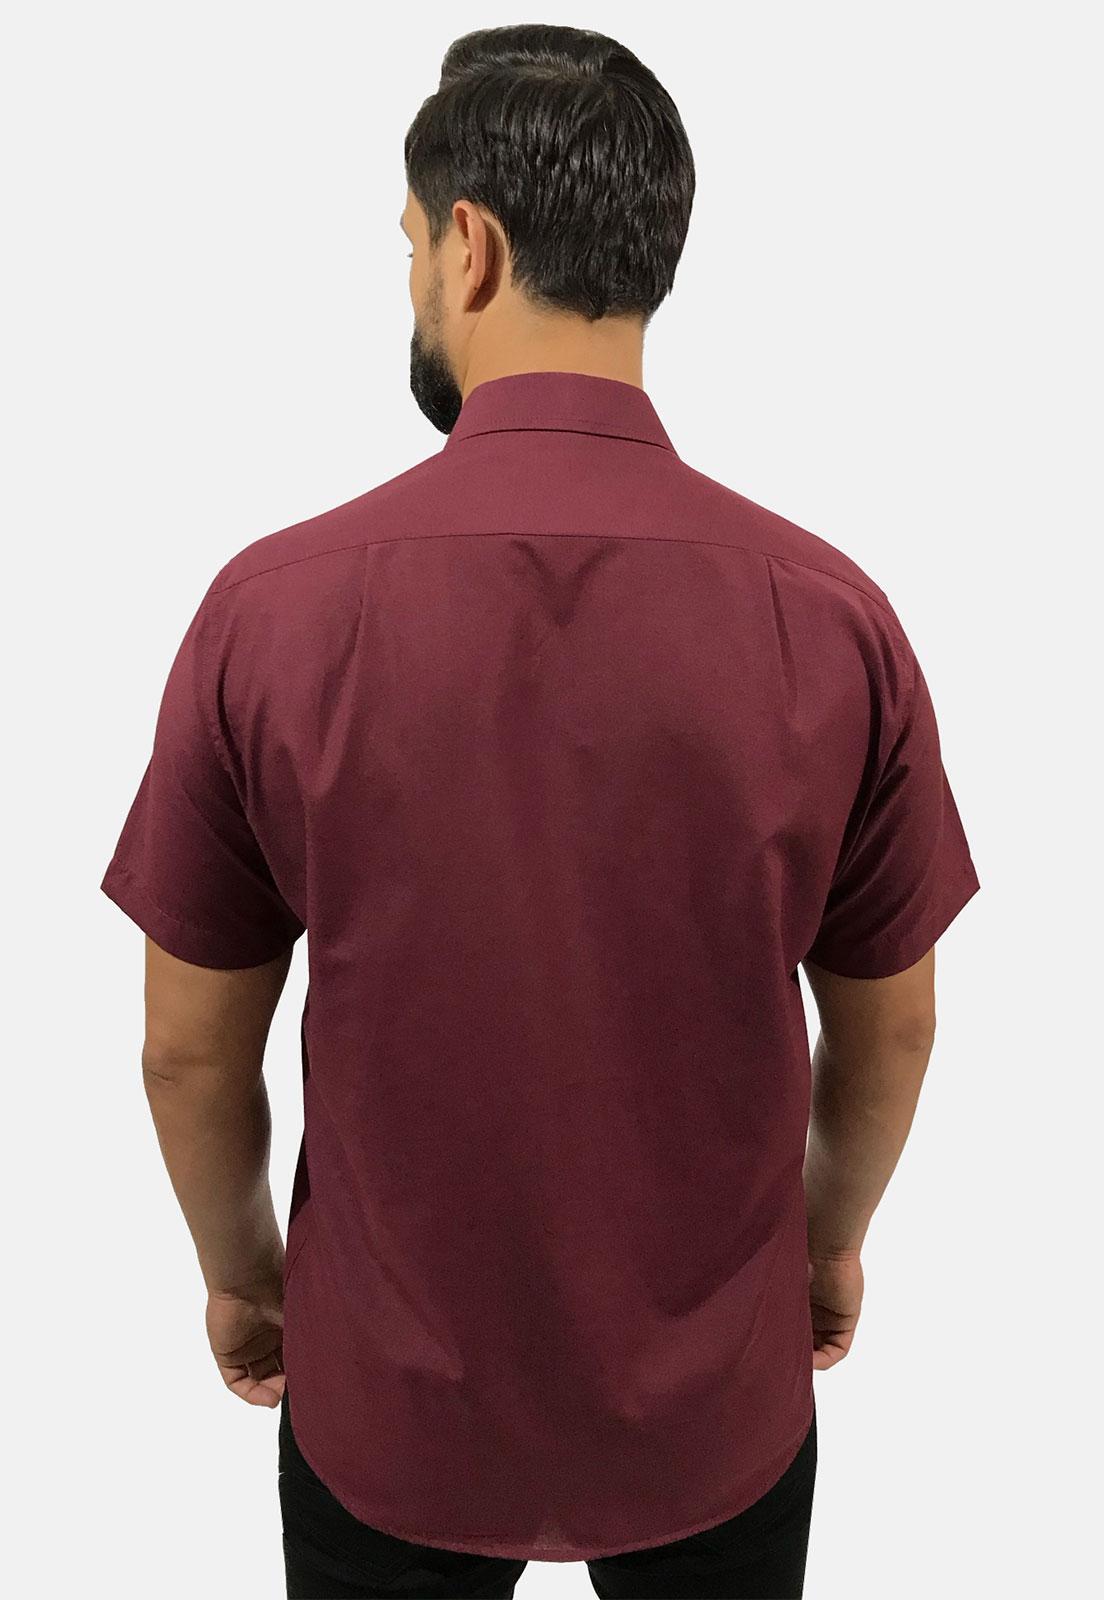 Camisa Social Masculina Olimpo Lisa com Bolso Manga Curta